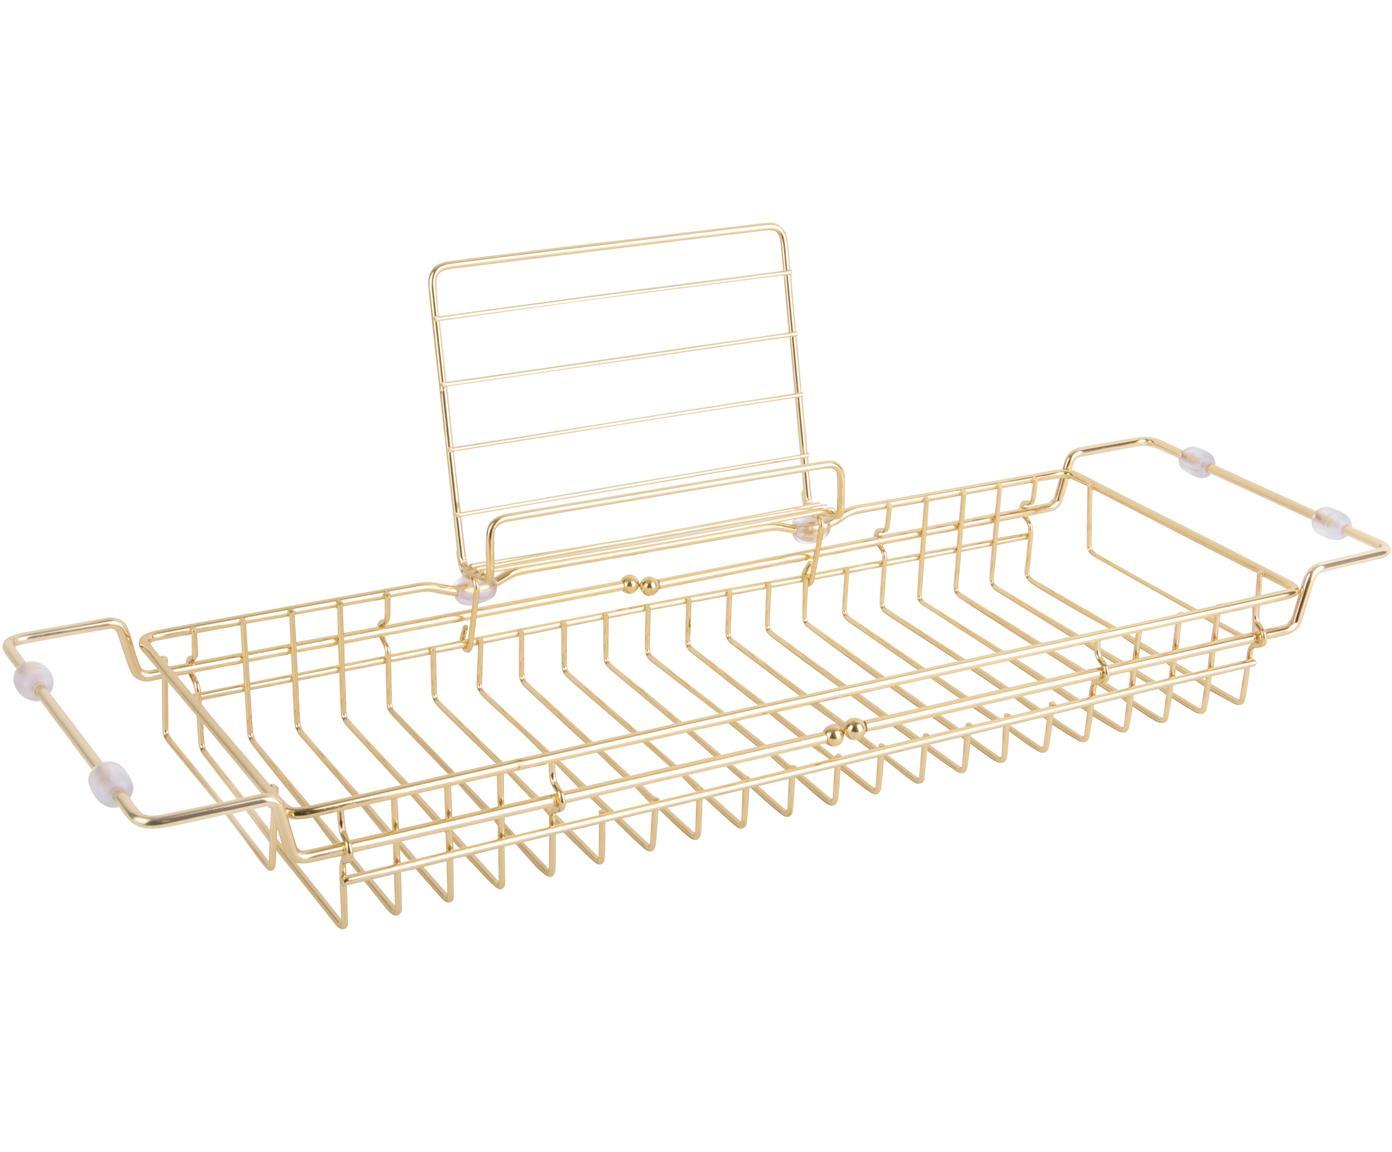 Estante de bañera Tubad, Metal recubierto, Dorado, An 61x Al 18 cm